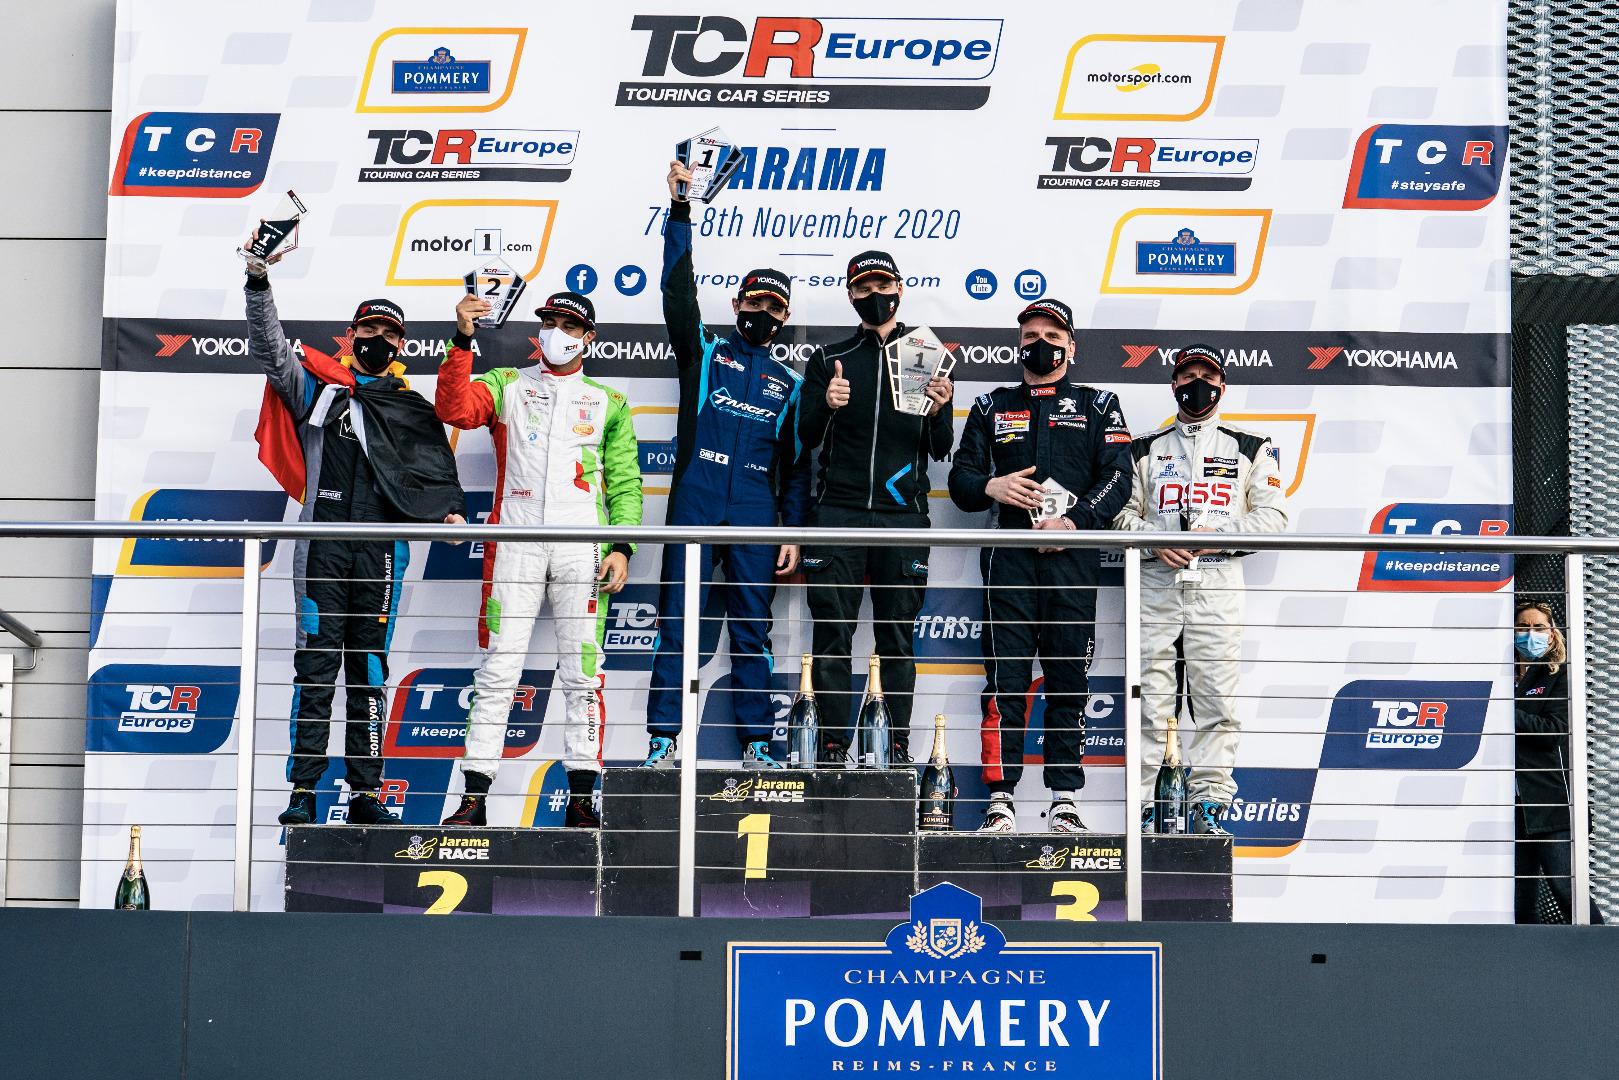 2020_eur_jarama_race_2_podium_26.jpg